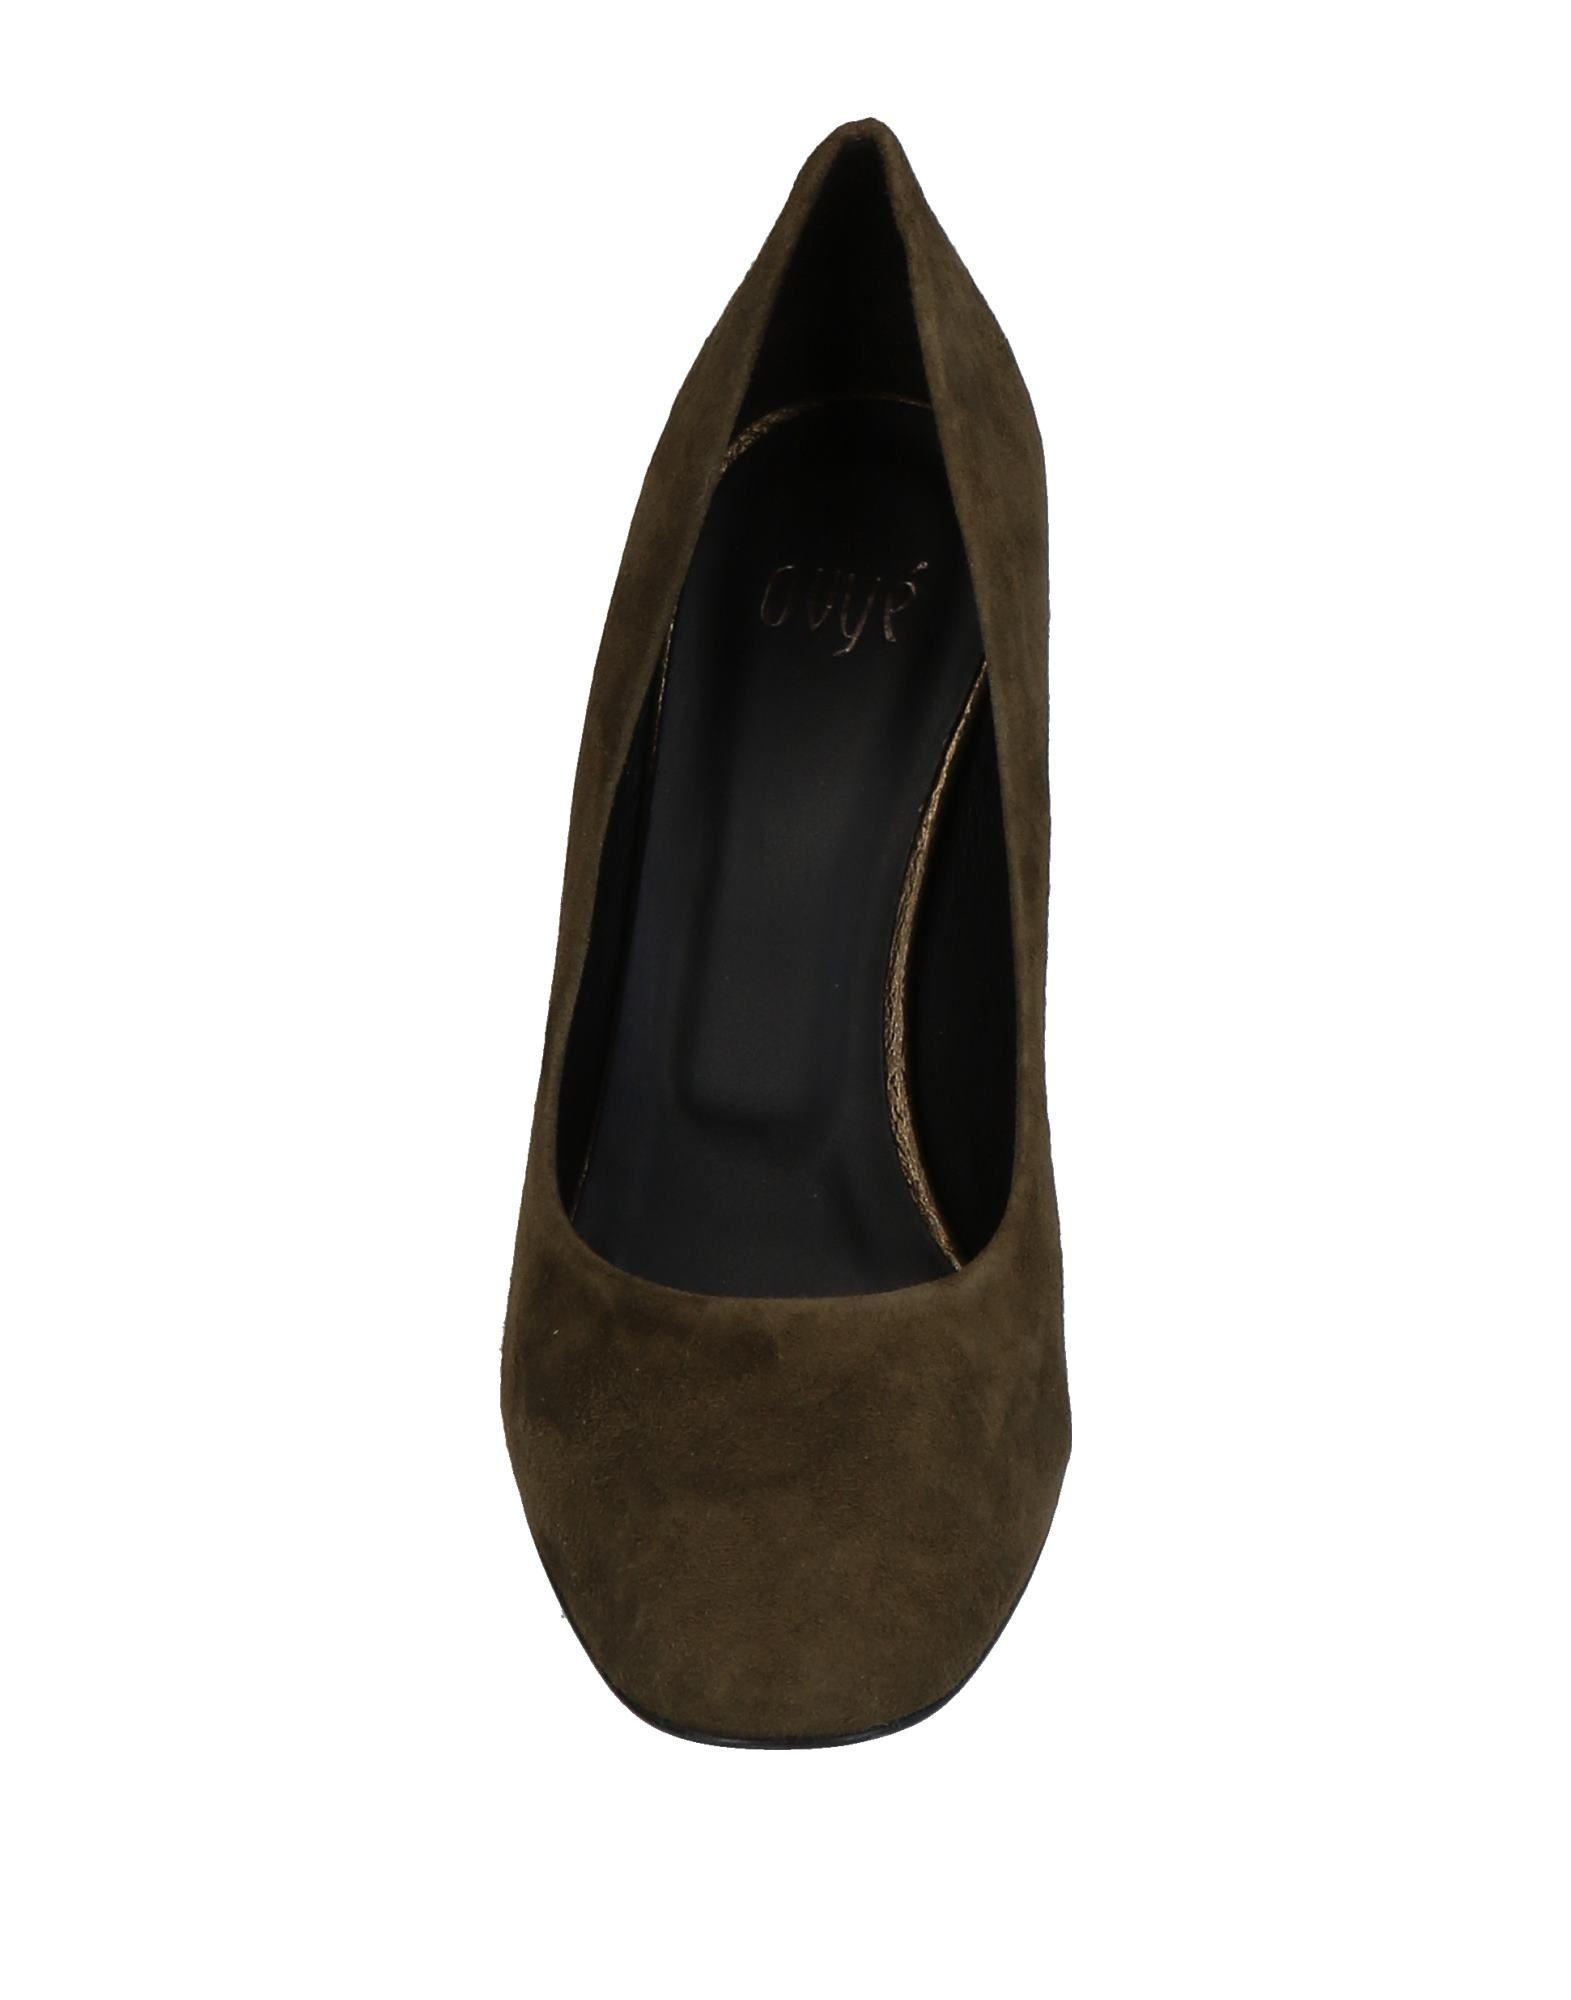 Ovye' By Cristina Qualität Lucchi Pumps Damen  11456804CD Gute Qualität Cristina beliebte Schuhe f8fa70